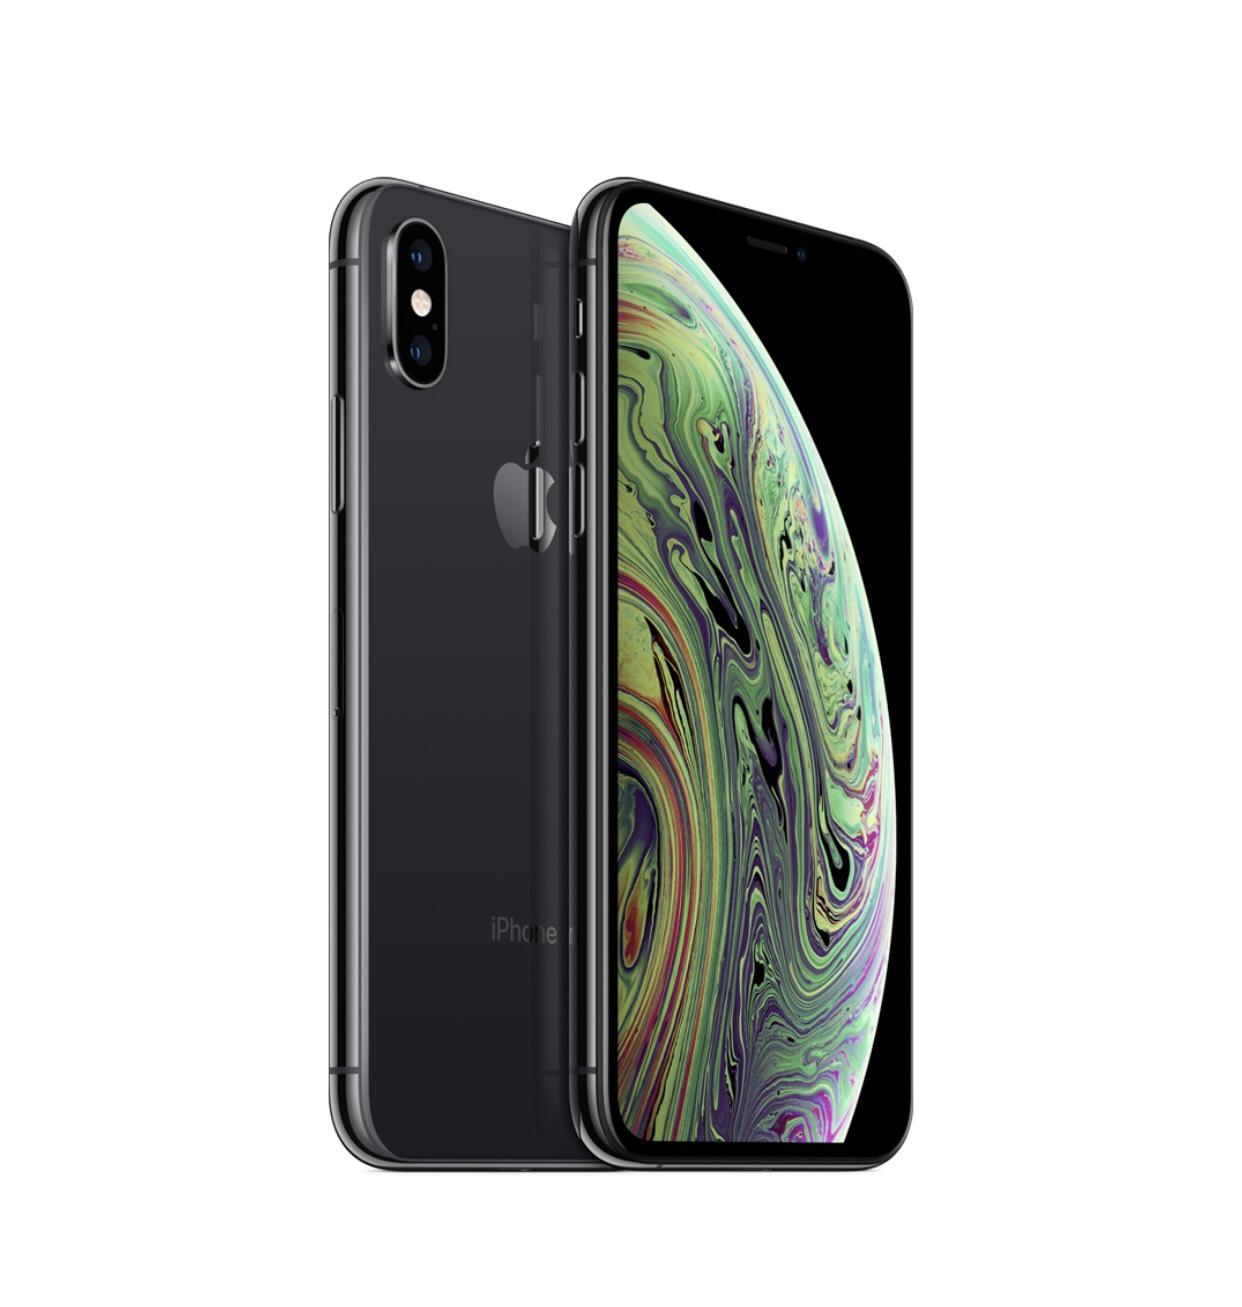 Apple IPhone XS über Congstar - Ersparnis 16-17%